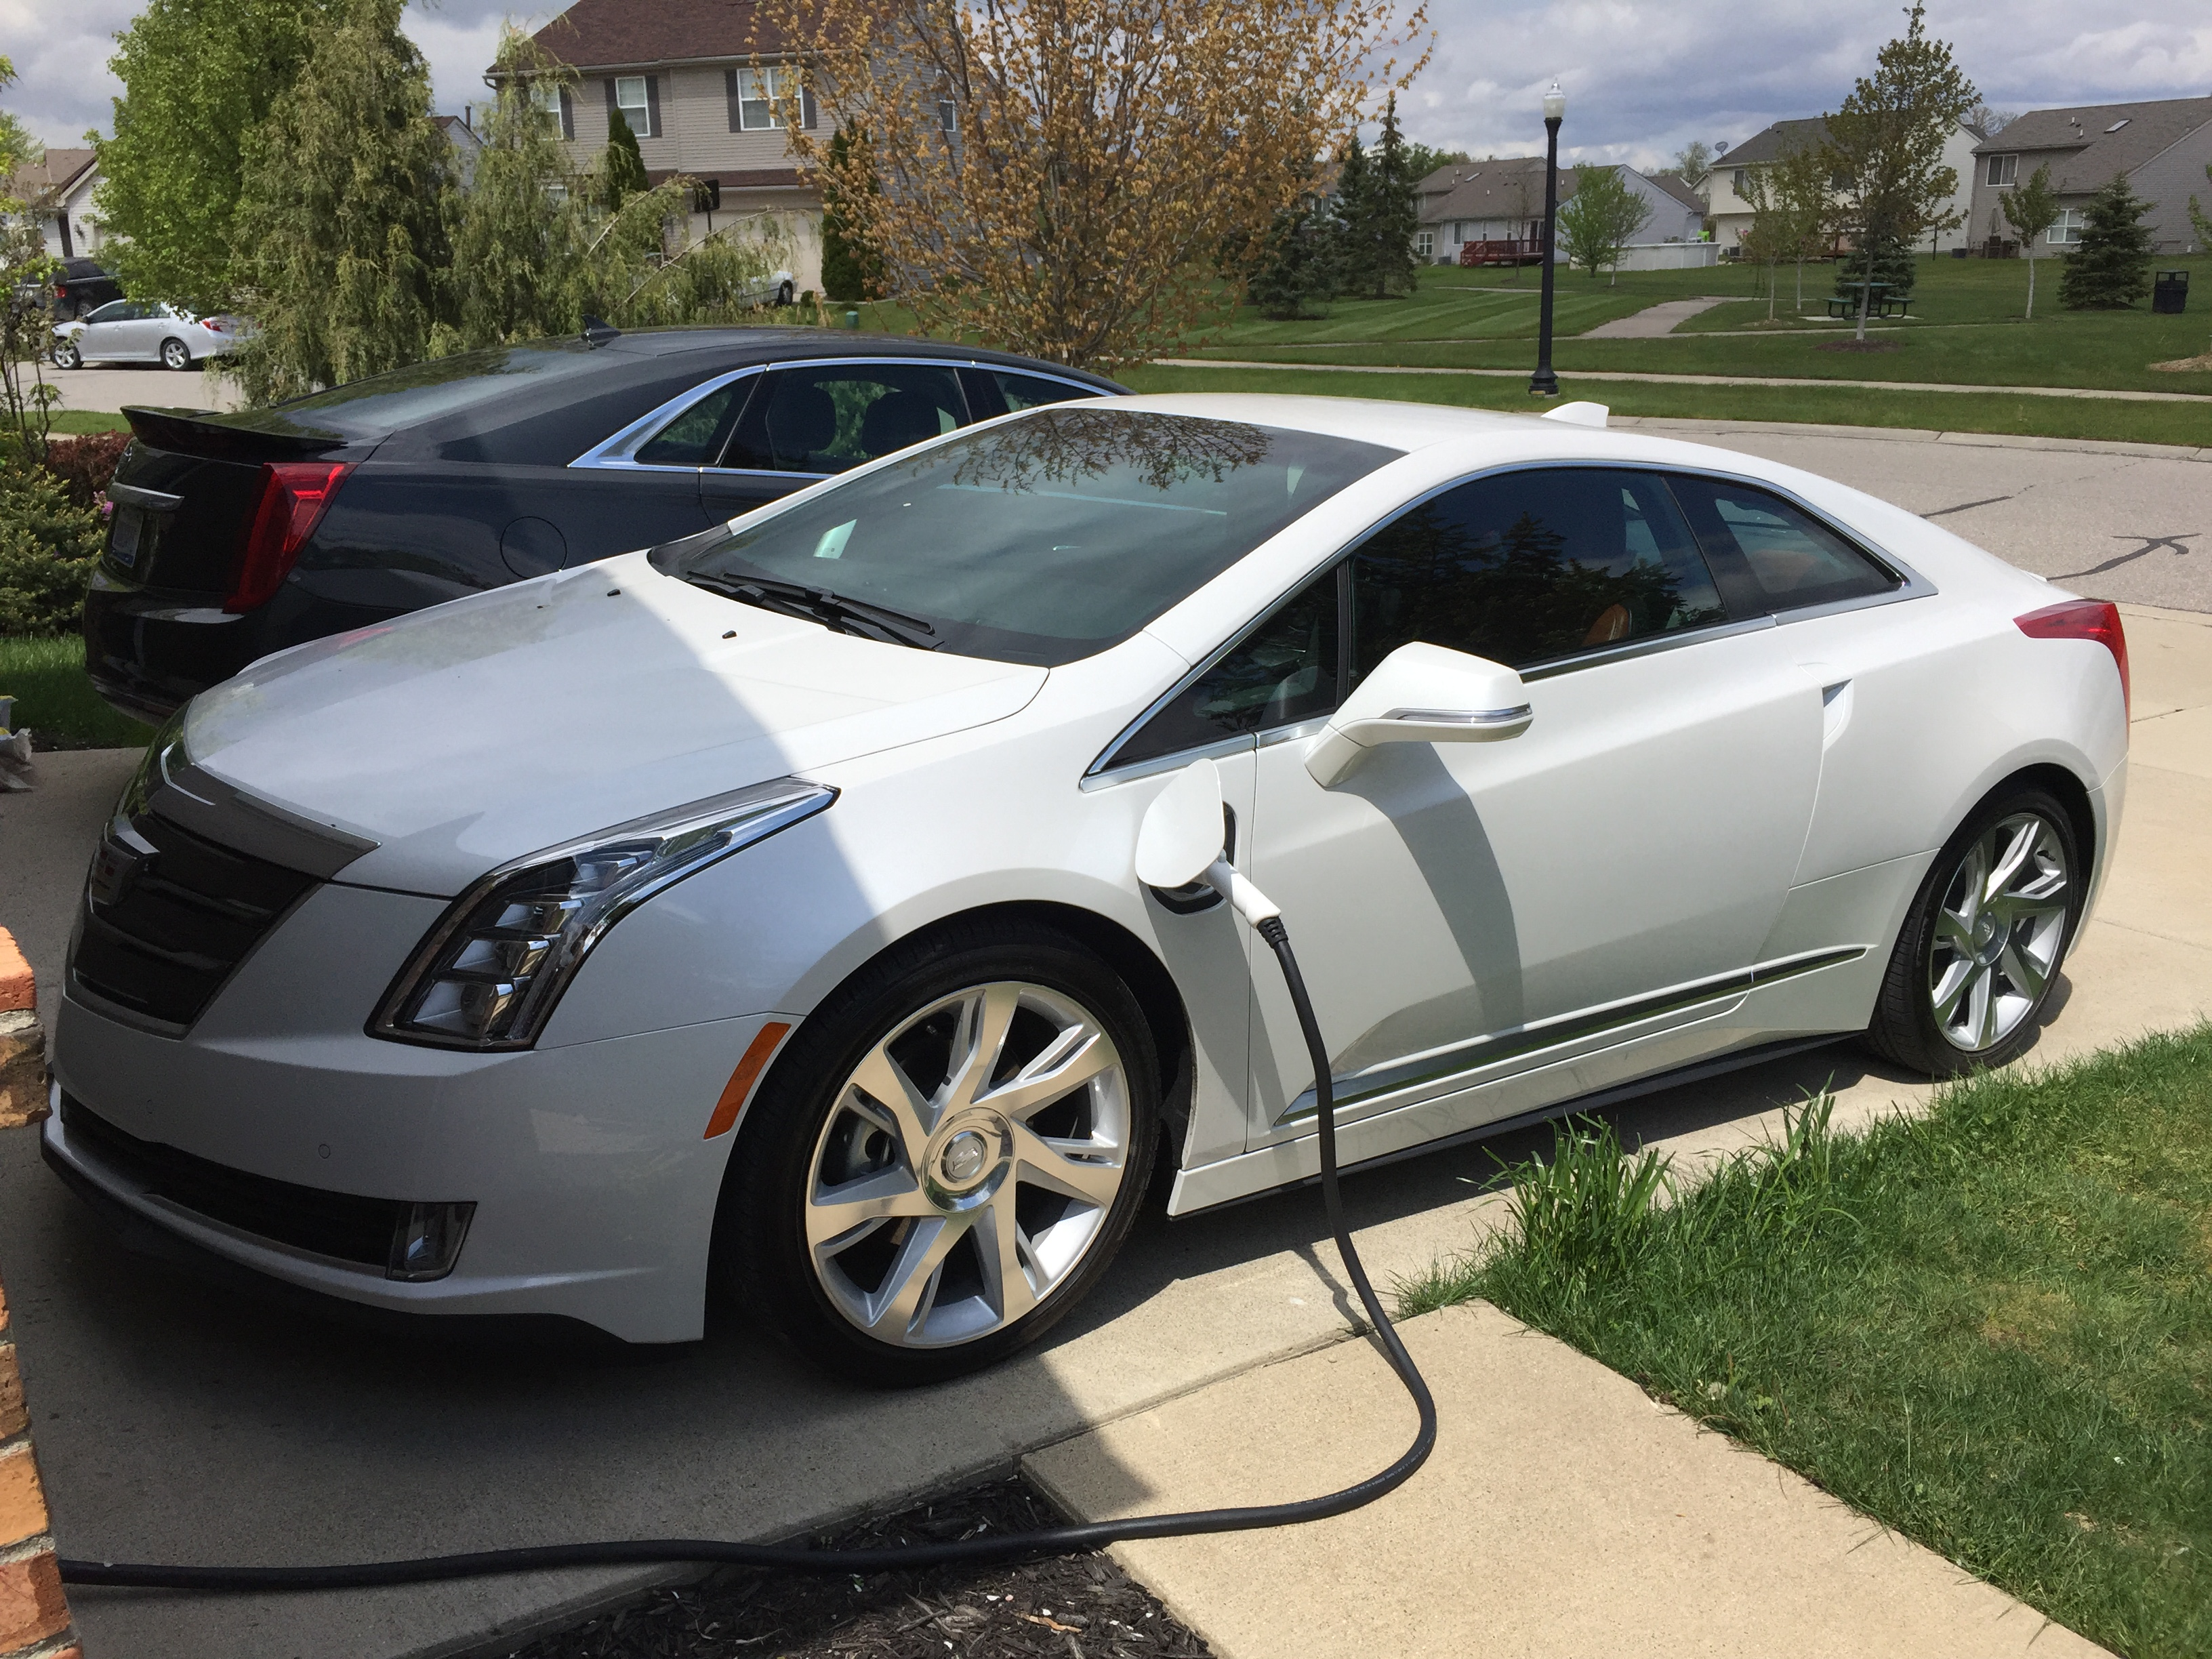 Suburban Chevrolet Cadillac 3515 Jackson Rd, Ann Arbor, MI ...